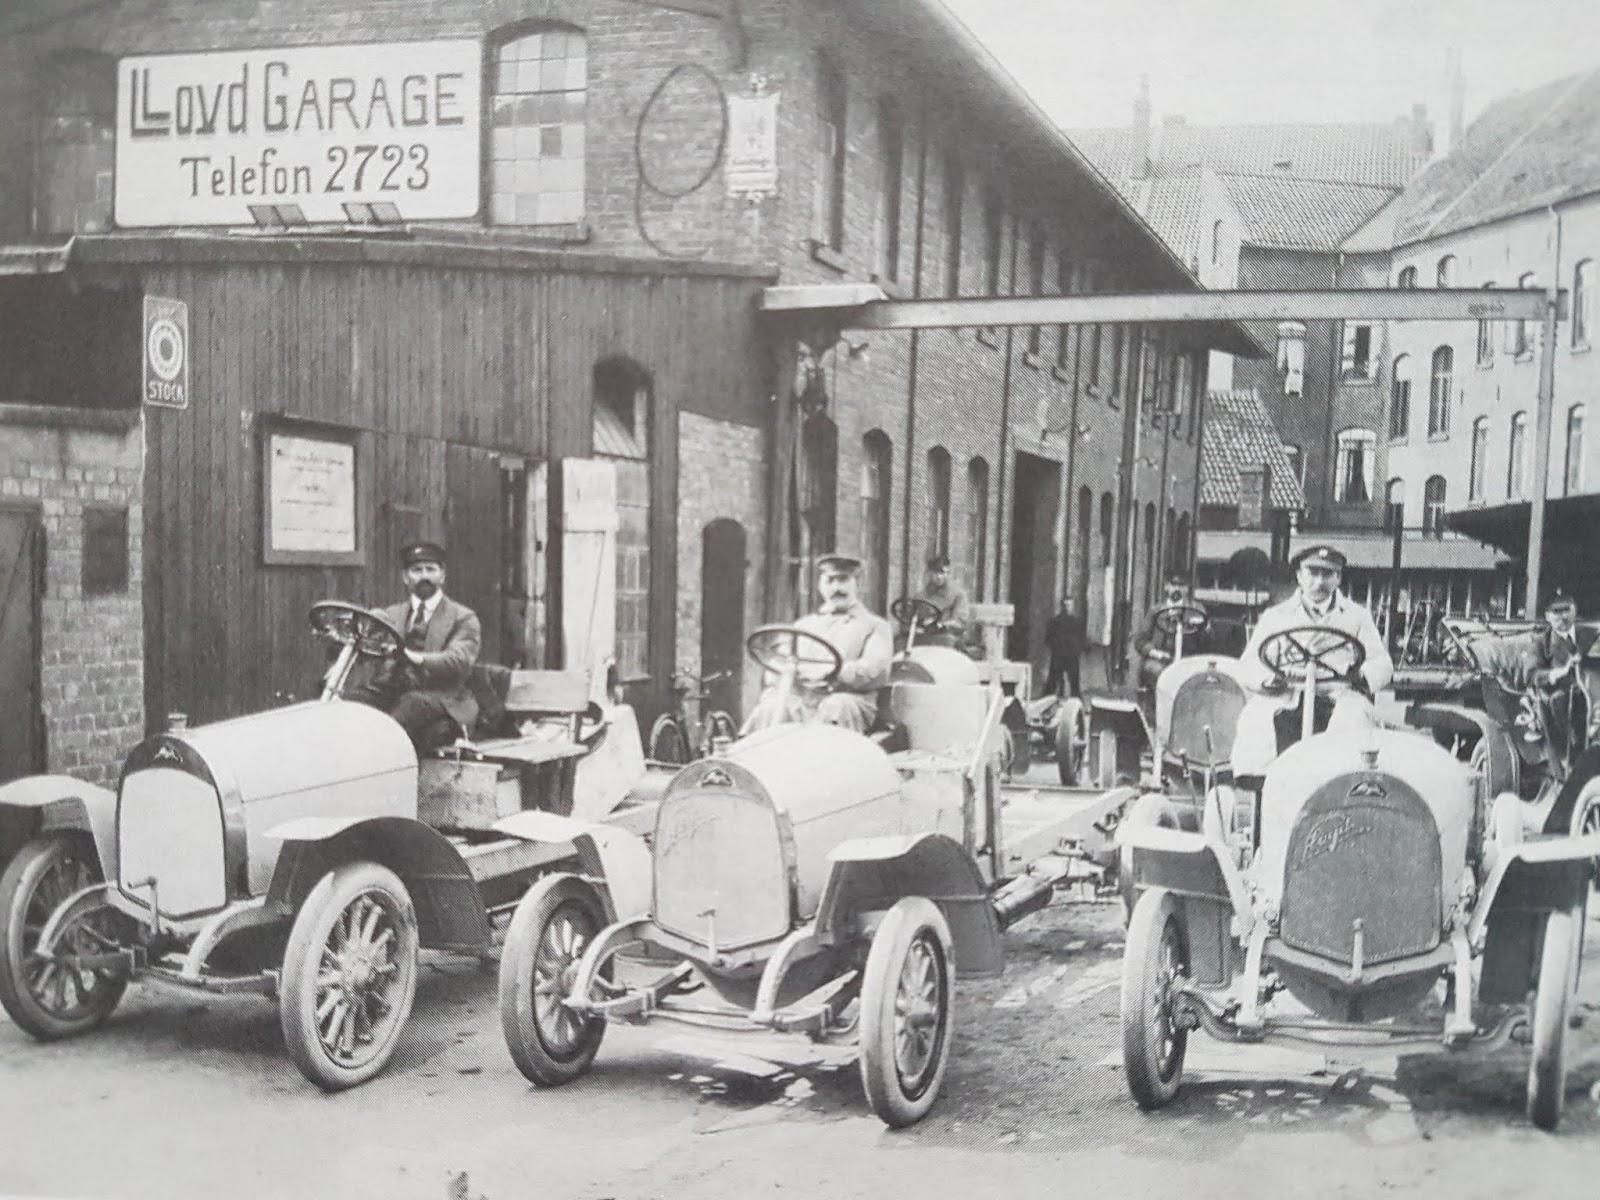 hansa--logo-garage-oldtimer